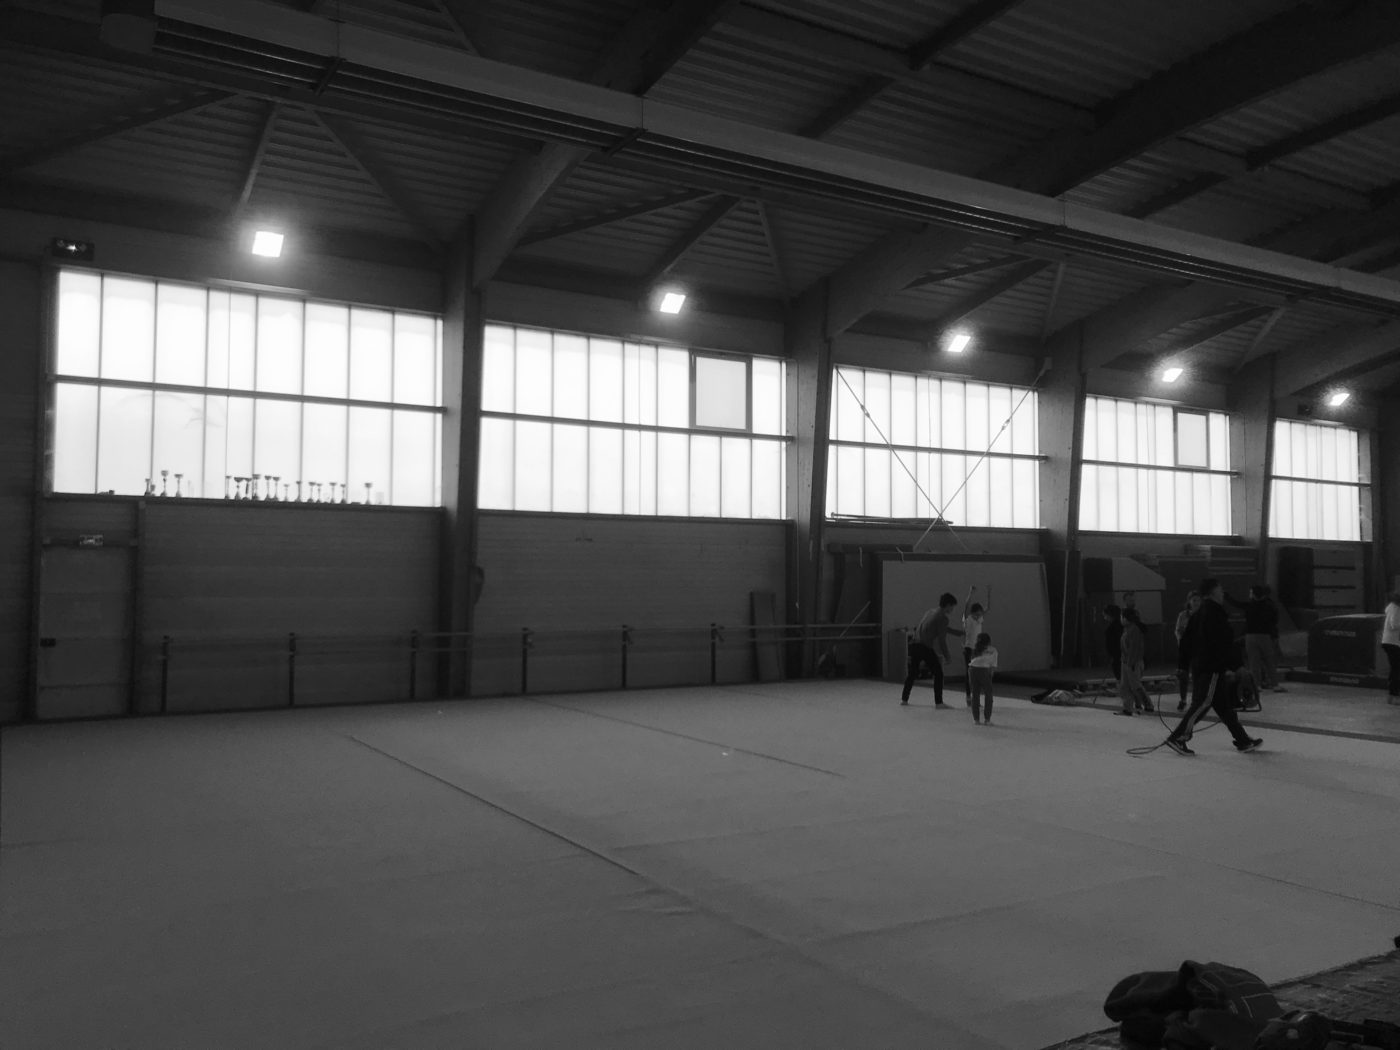 Nouveau gymnase version 2019